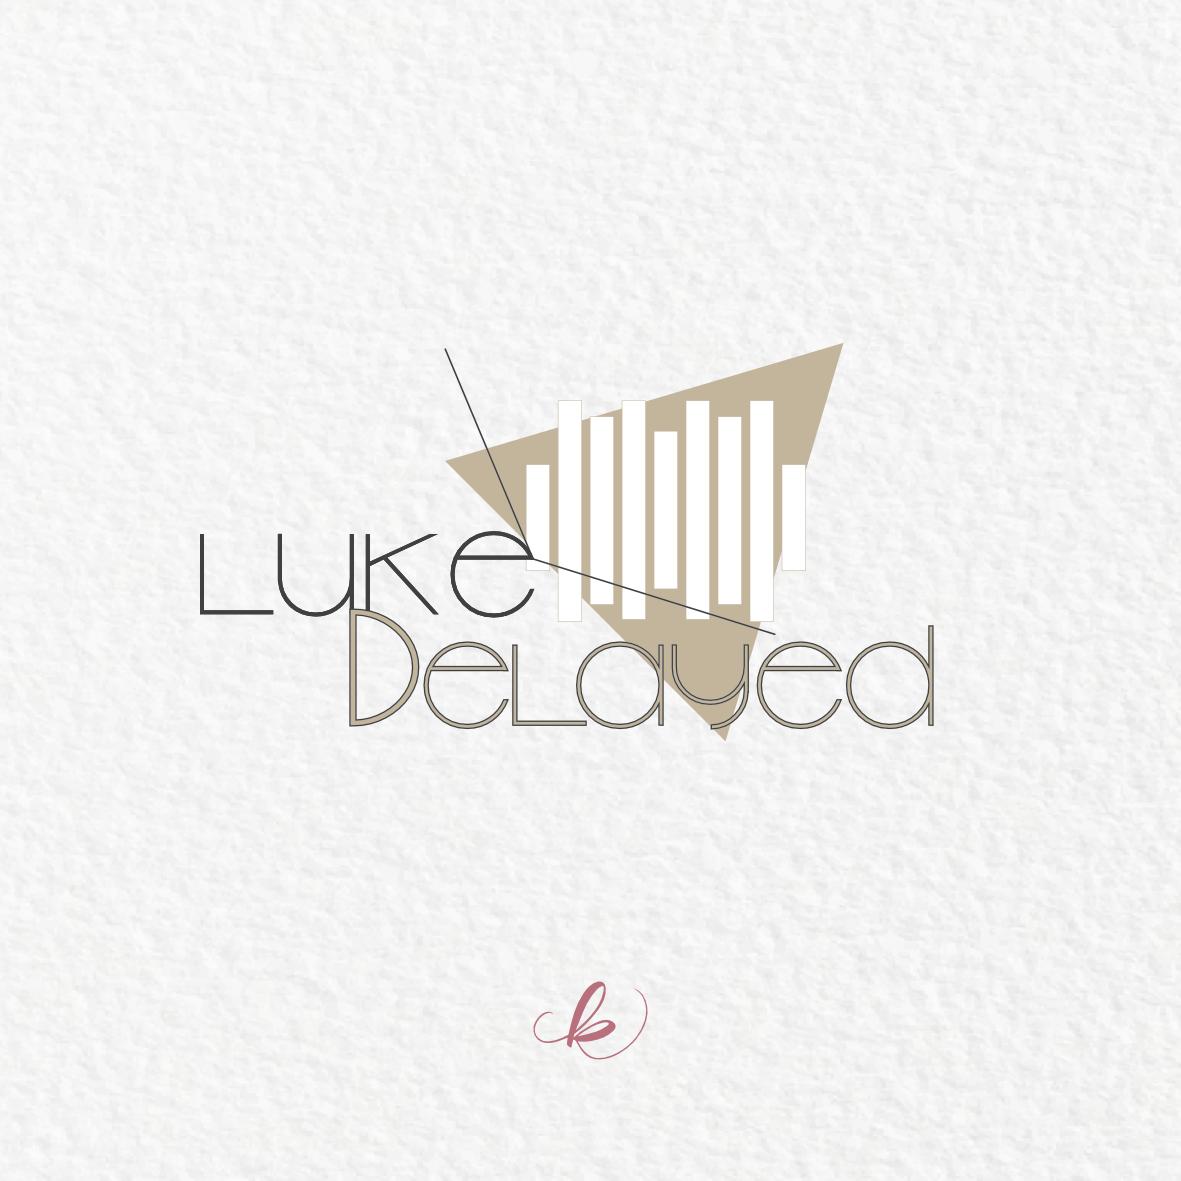 Luke Delayed